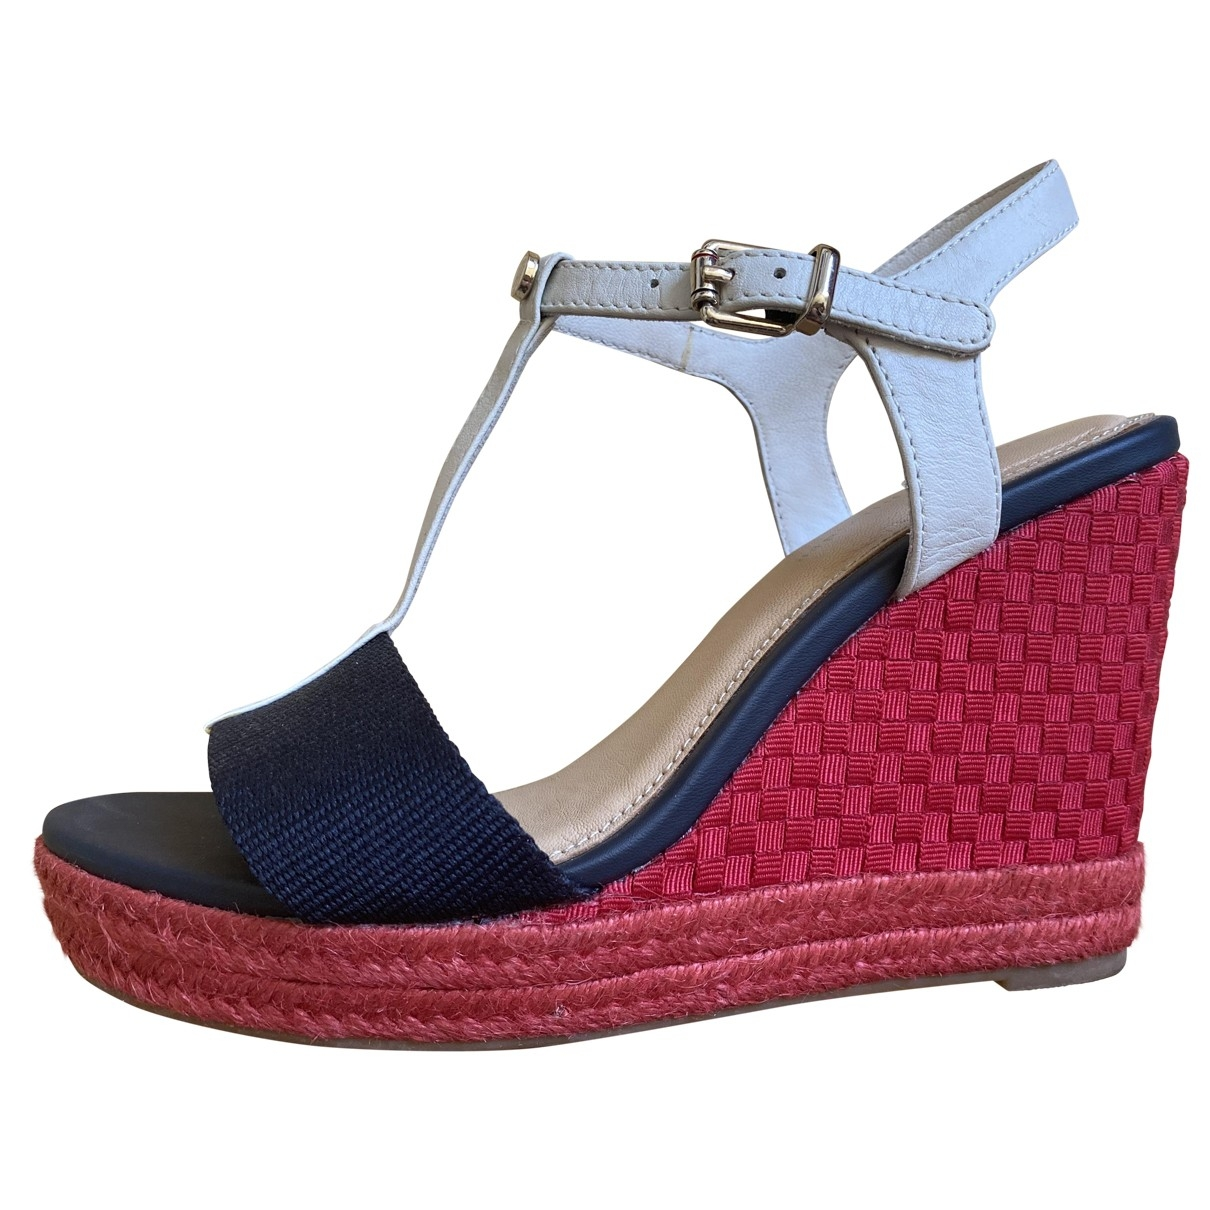 Tommy Hilfiger \N Leather Sandals for Women 37 EU